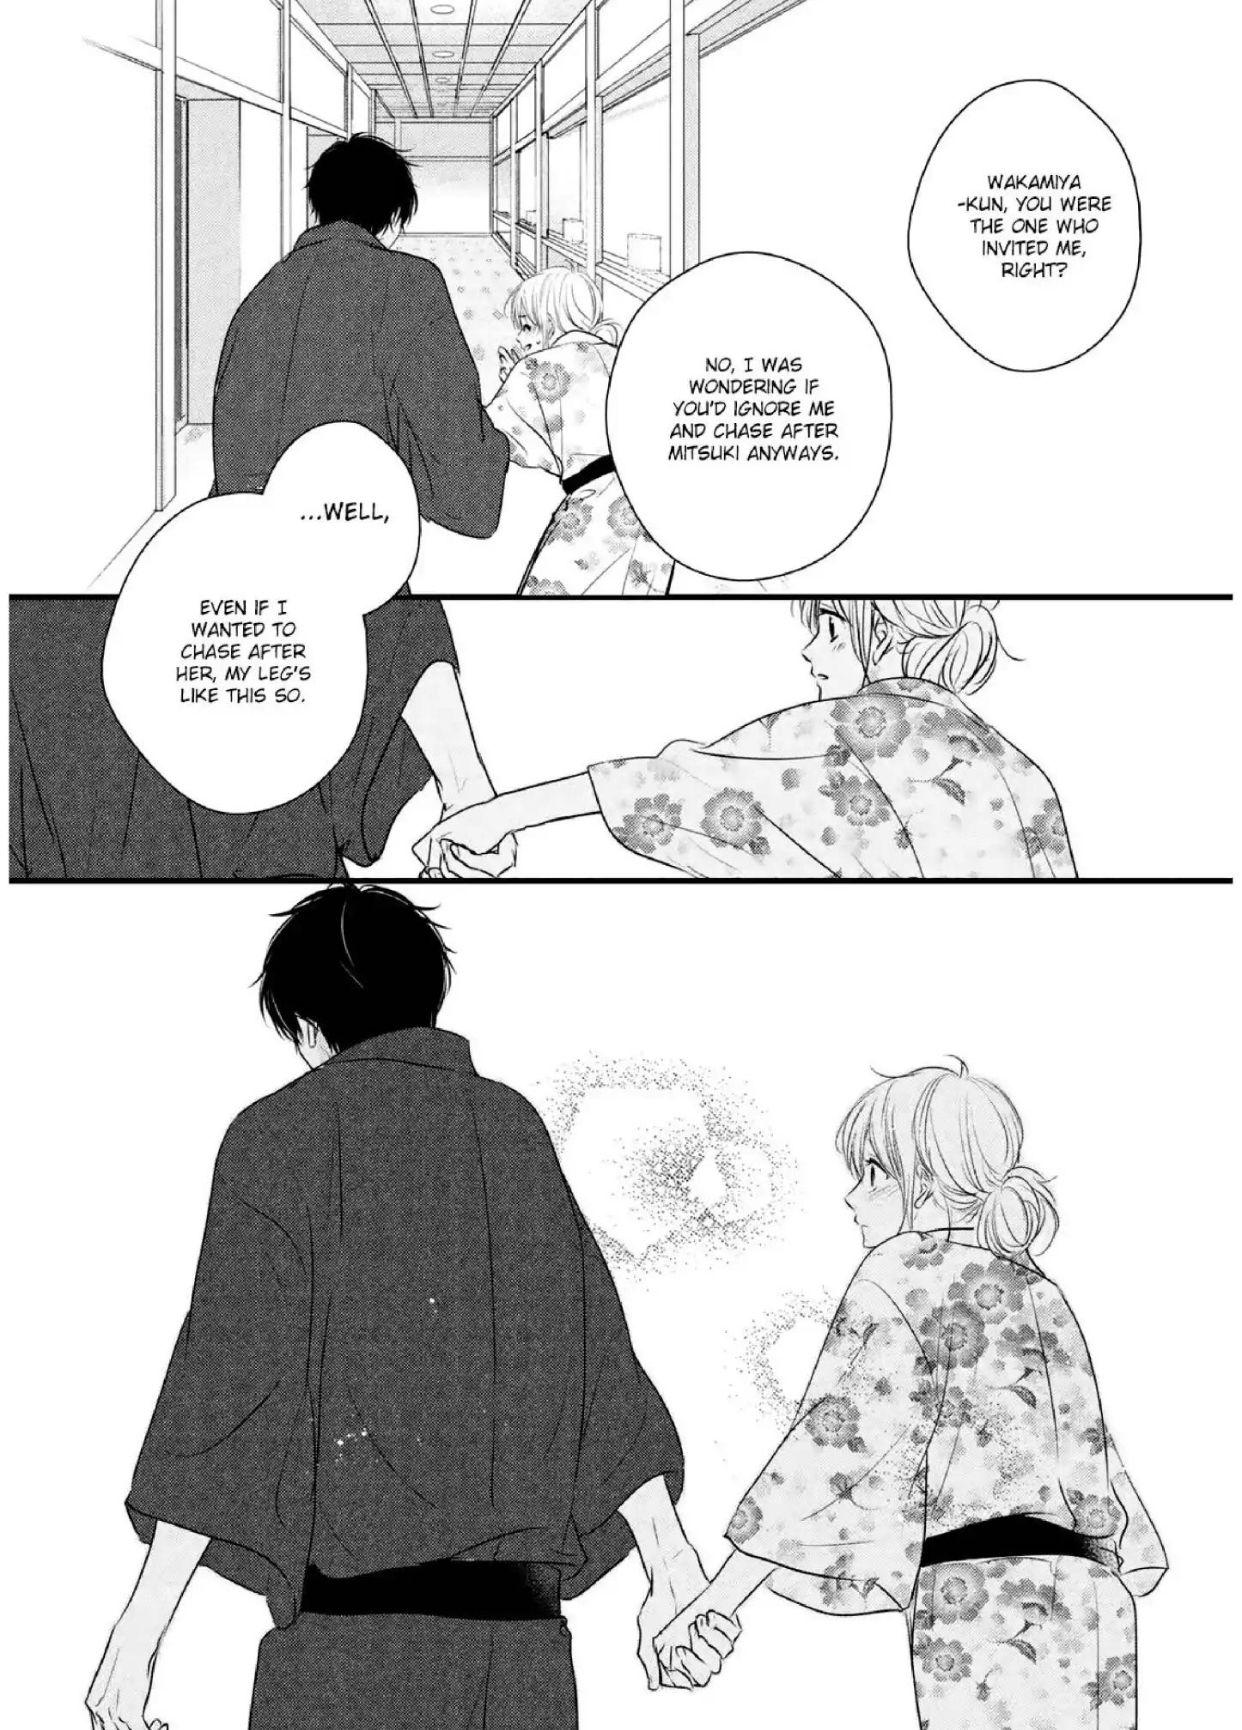 Pin By Animemangaluver On Haru Matsu Bokura Waiting For Spring Manga Memes True Friends Good Looking Men